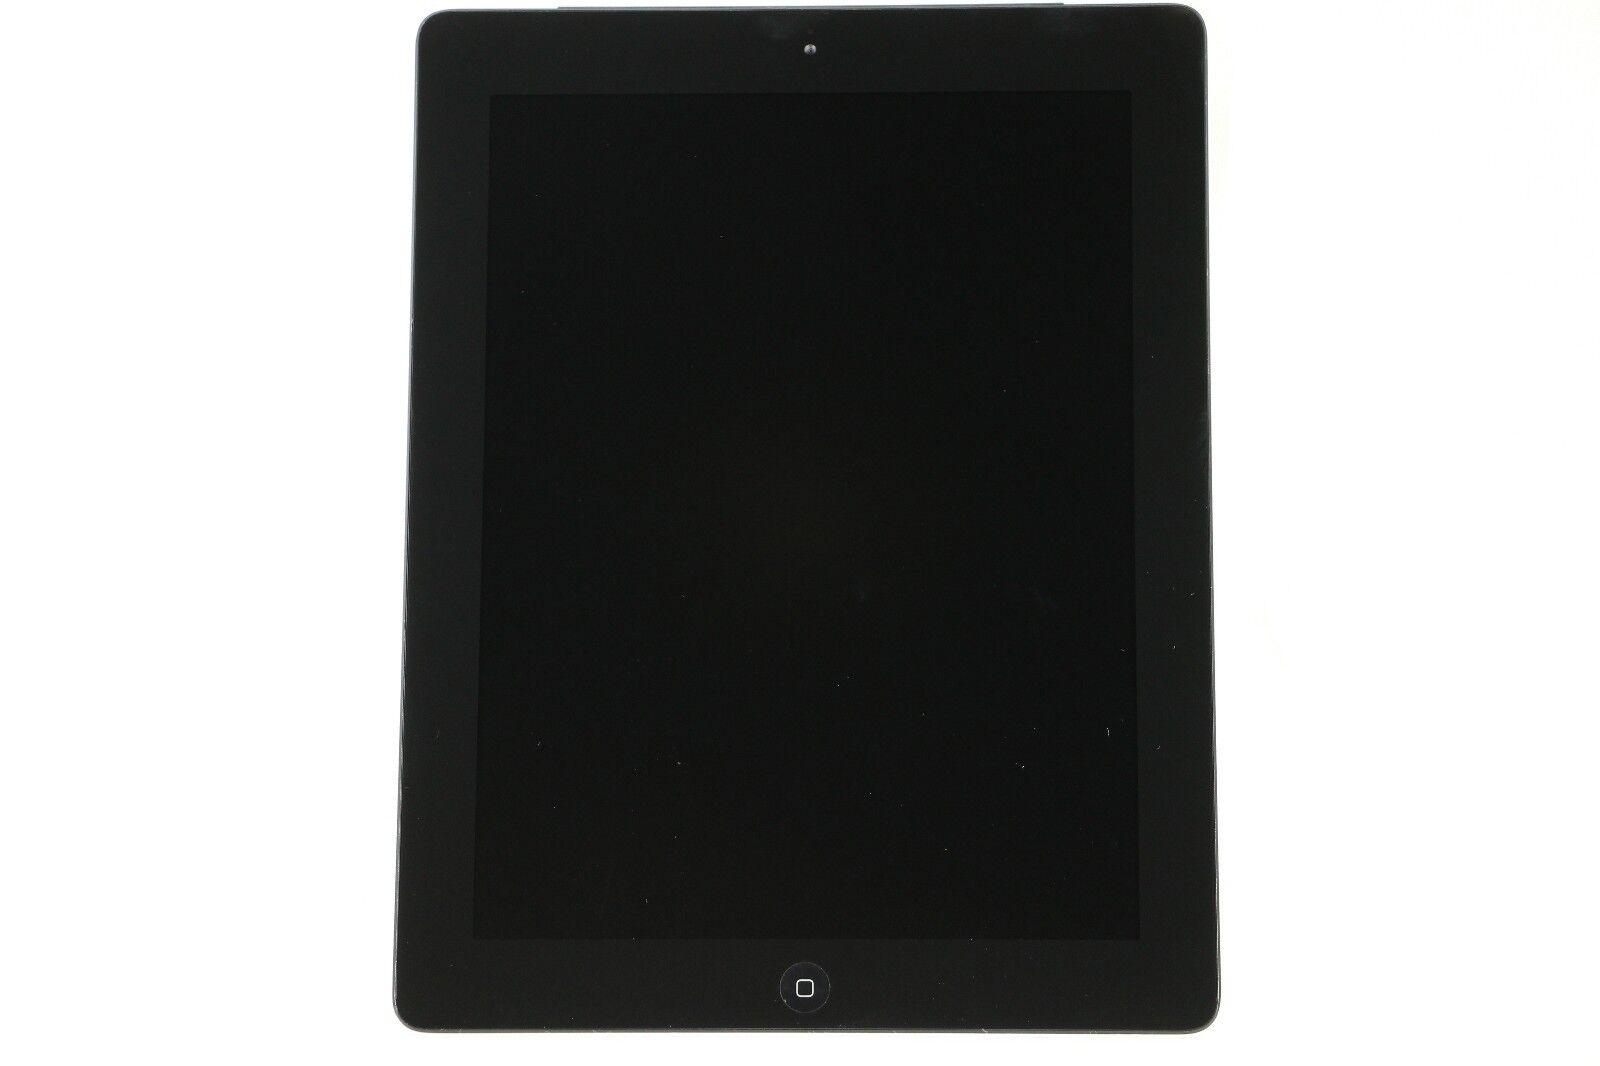 "Apple iPad 2 16GB, Wi-Fi + 3G (Verizon Unlocked), 9.7"", White Grade C (AVA)"